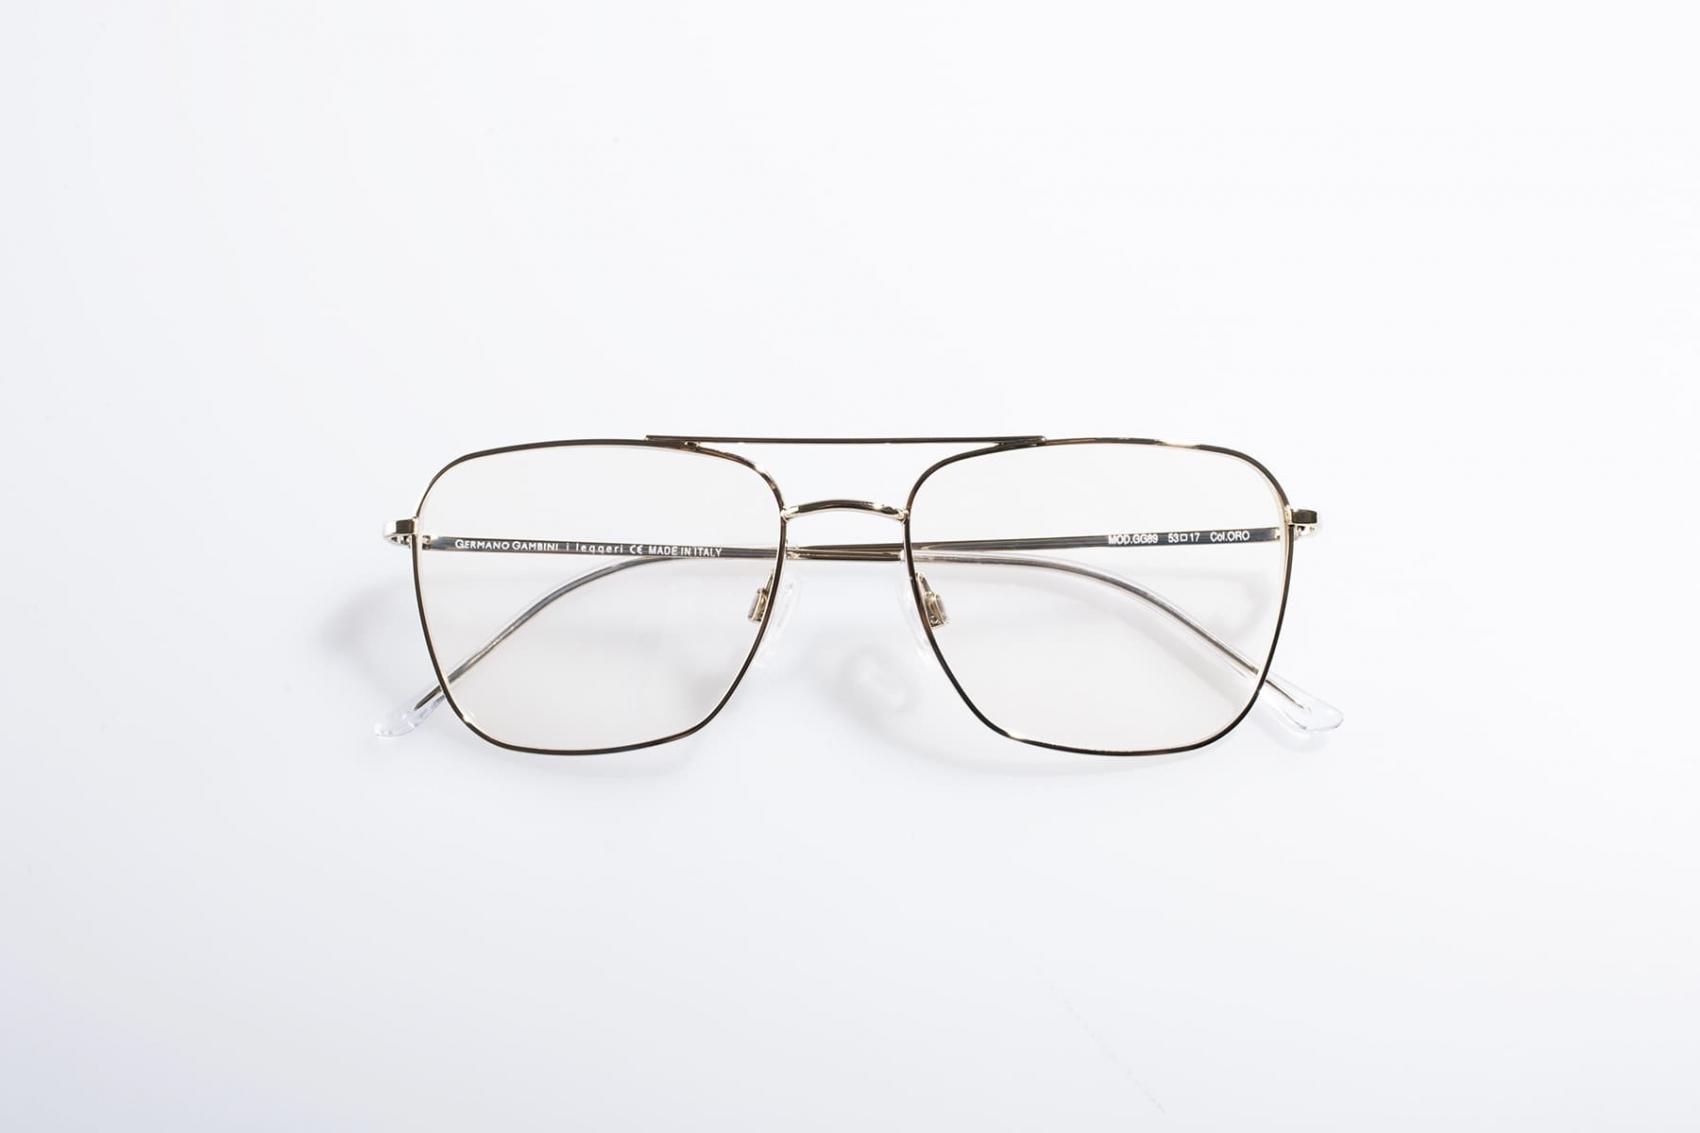 Gafas de diseño I leggeri By Germano Gambini-Óptica Gran Vía Barcelona-Óptica Gran Vía Barcelona